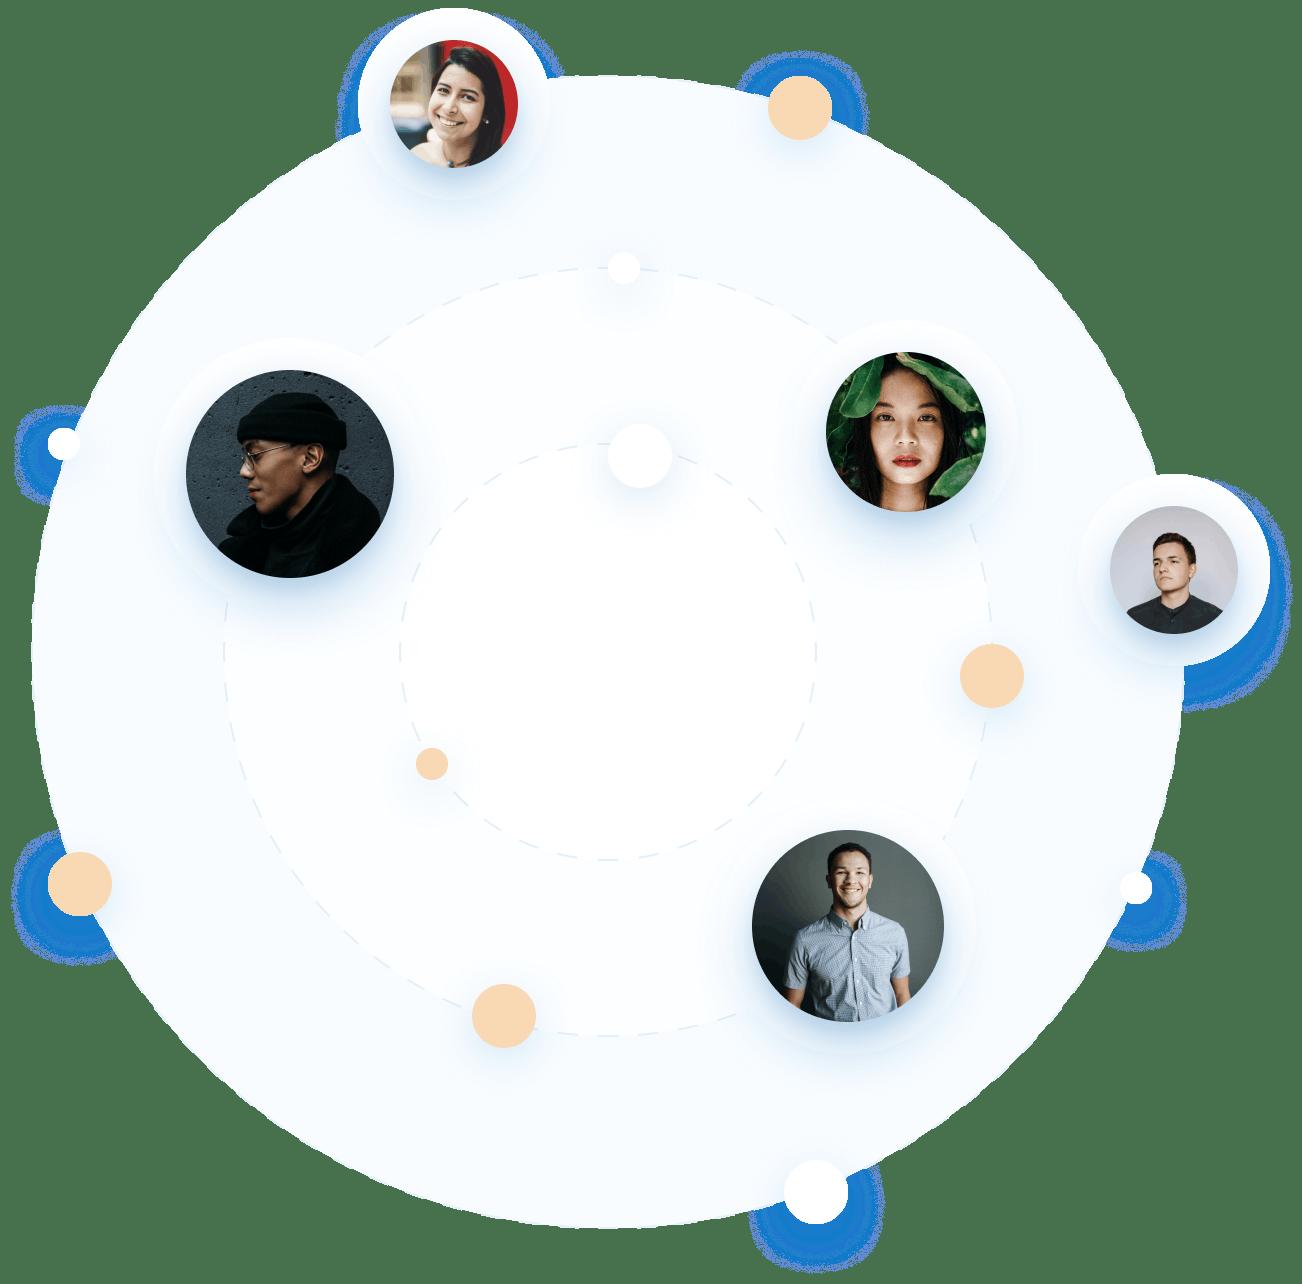 .Net Development Services - globe